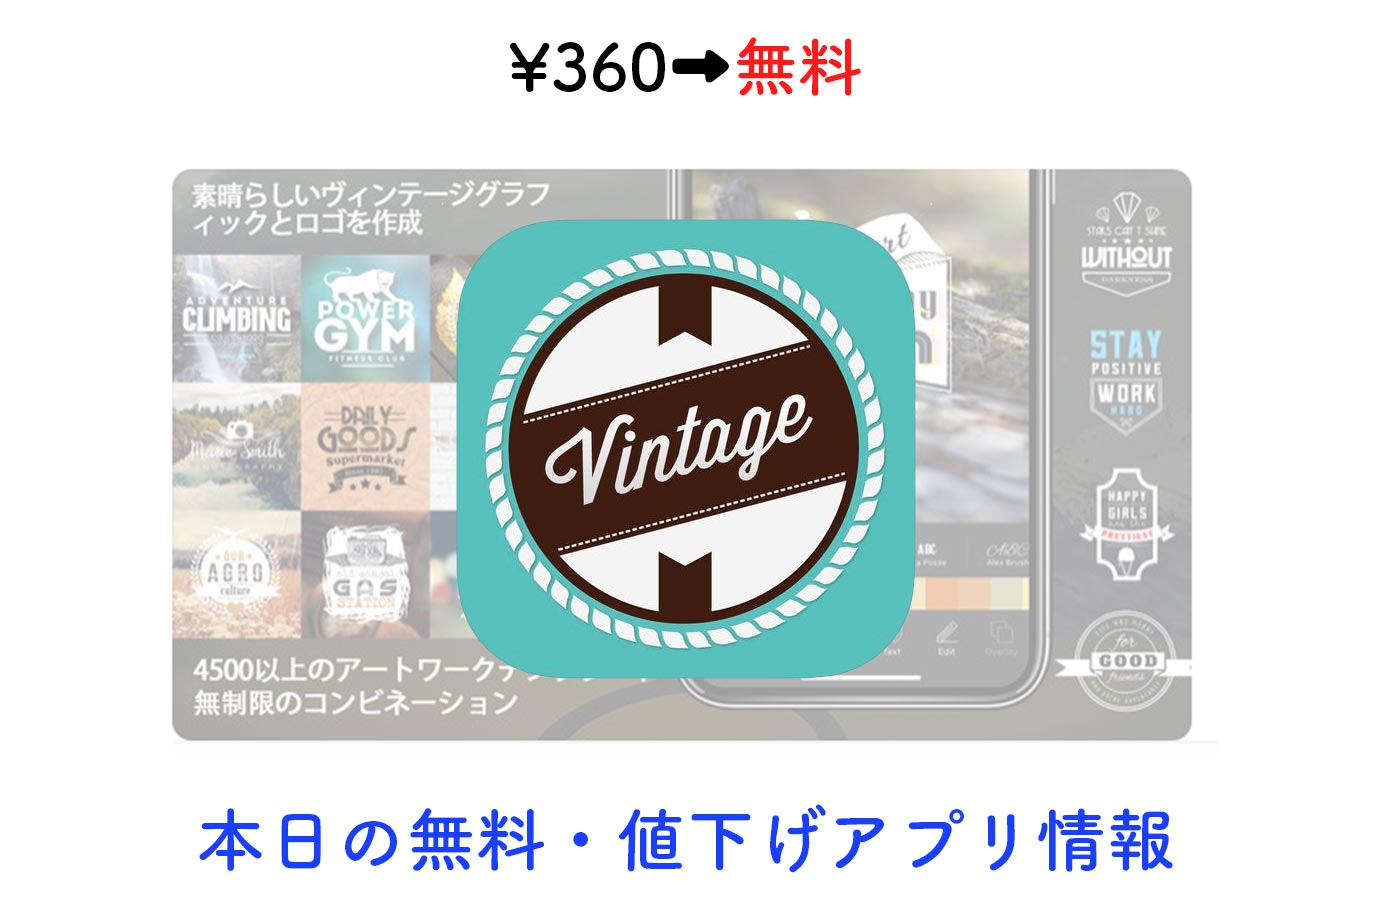 Appsale0511